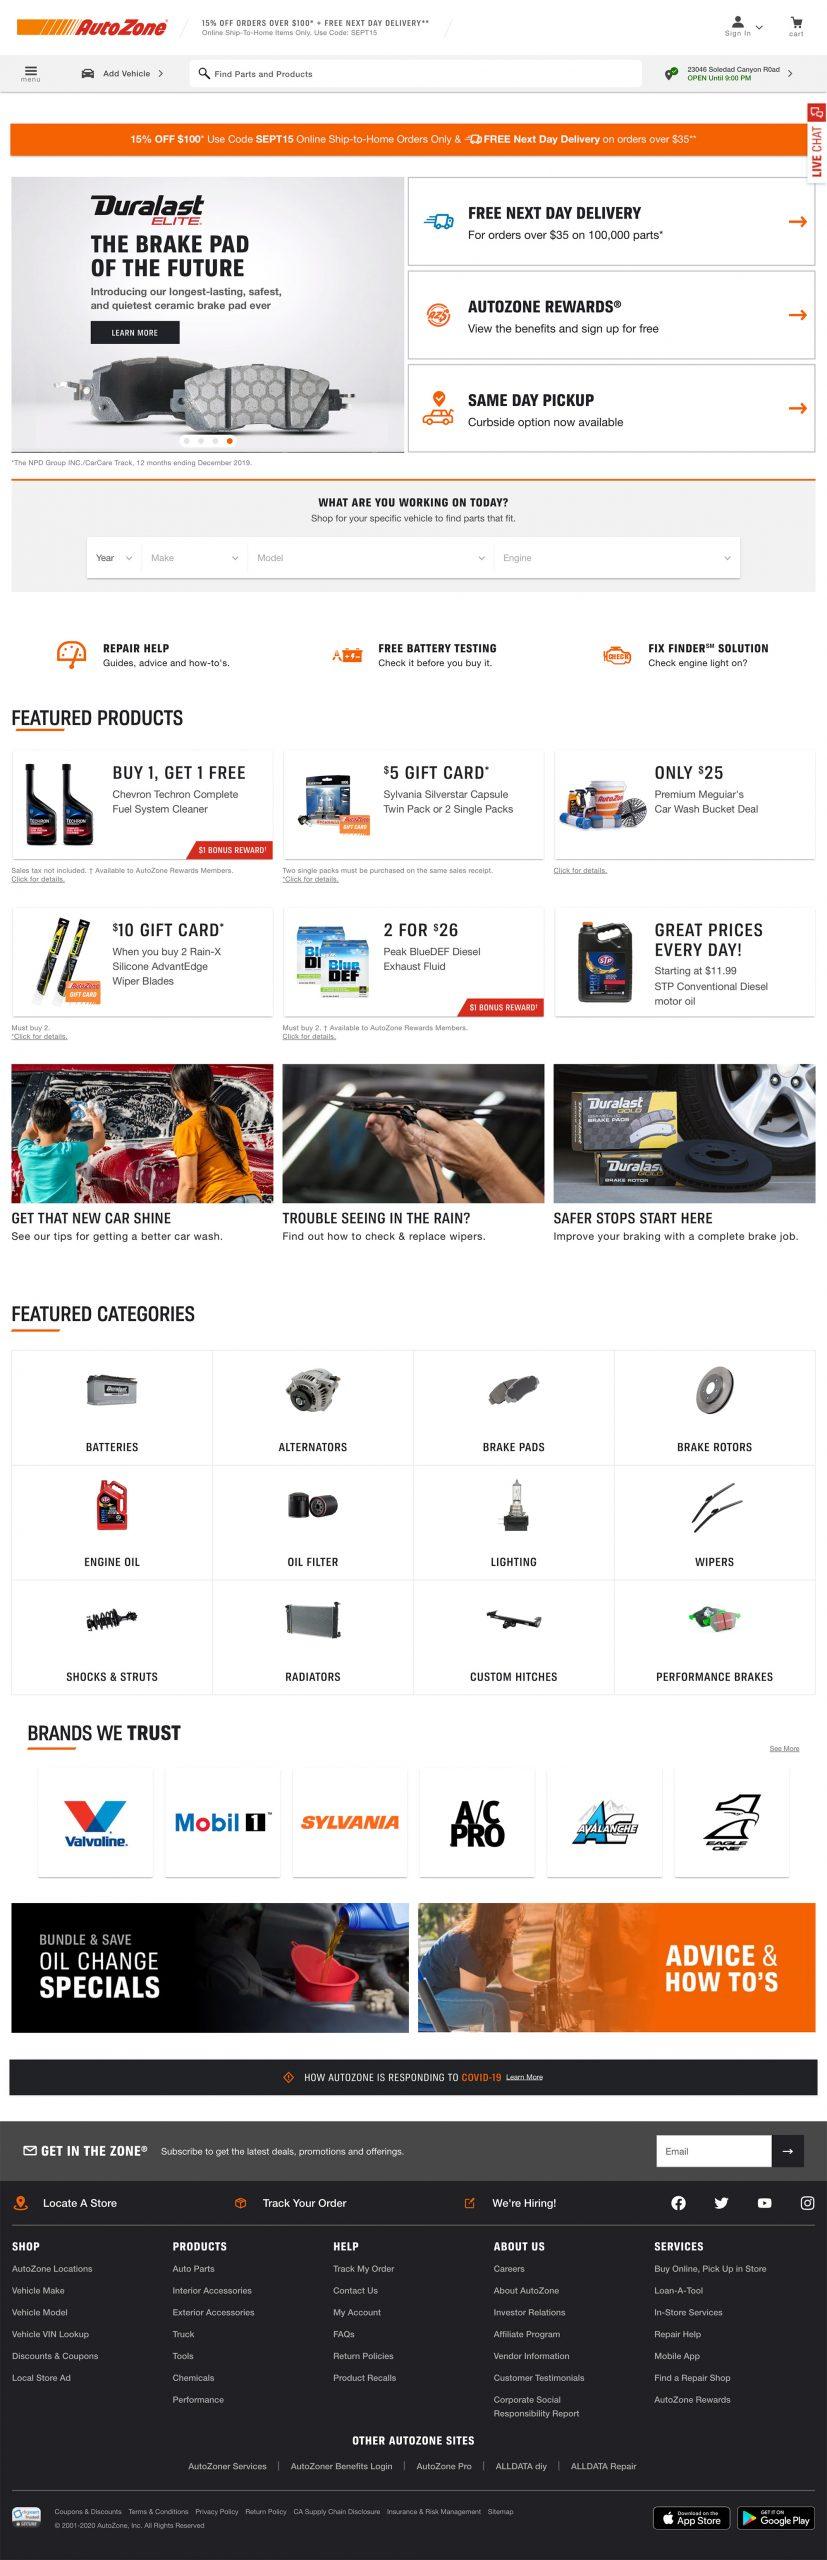 screenshot of autozone website